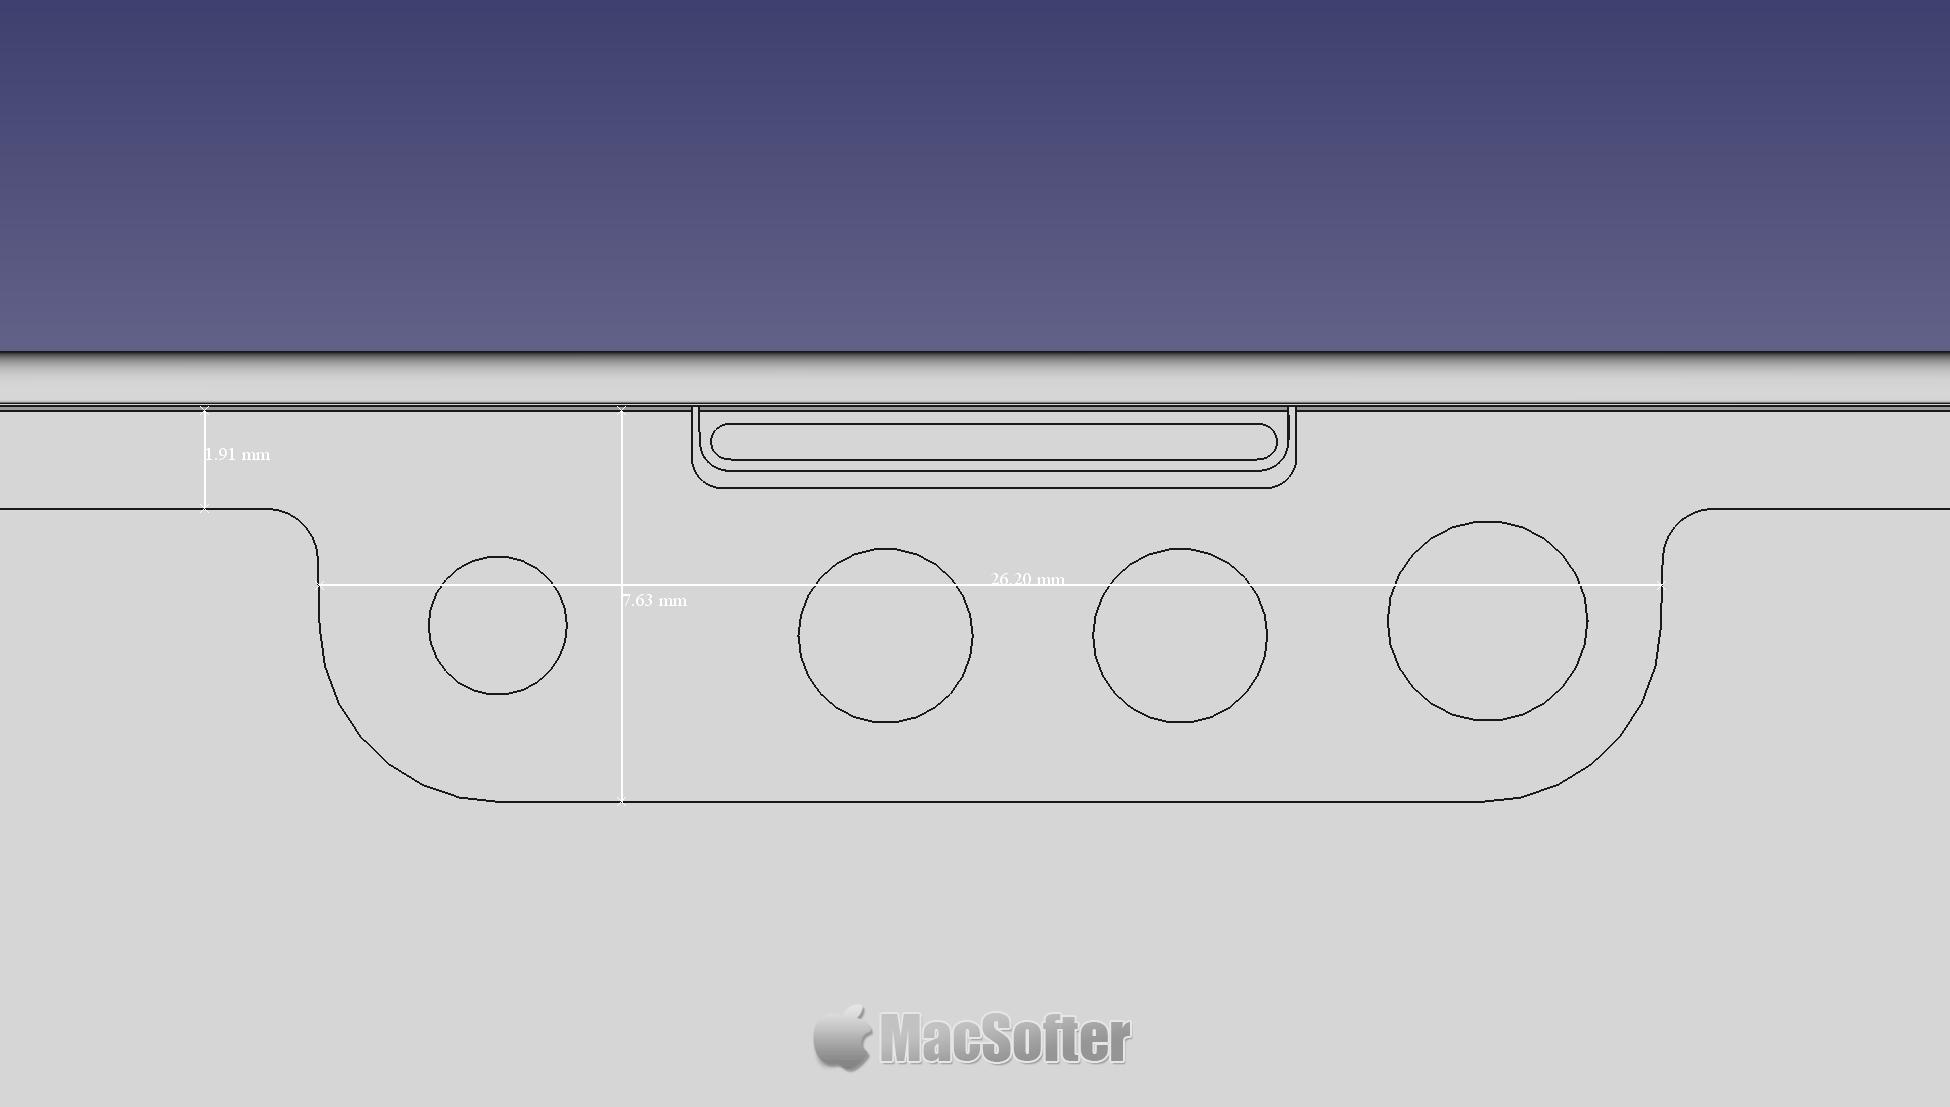 iPhone 13 CAD图遭曝光 : iPhone 13细节全揭露